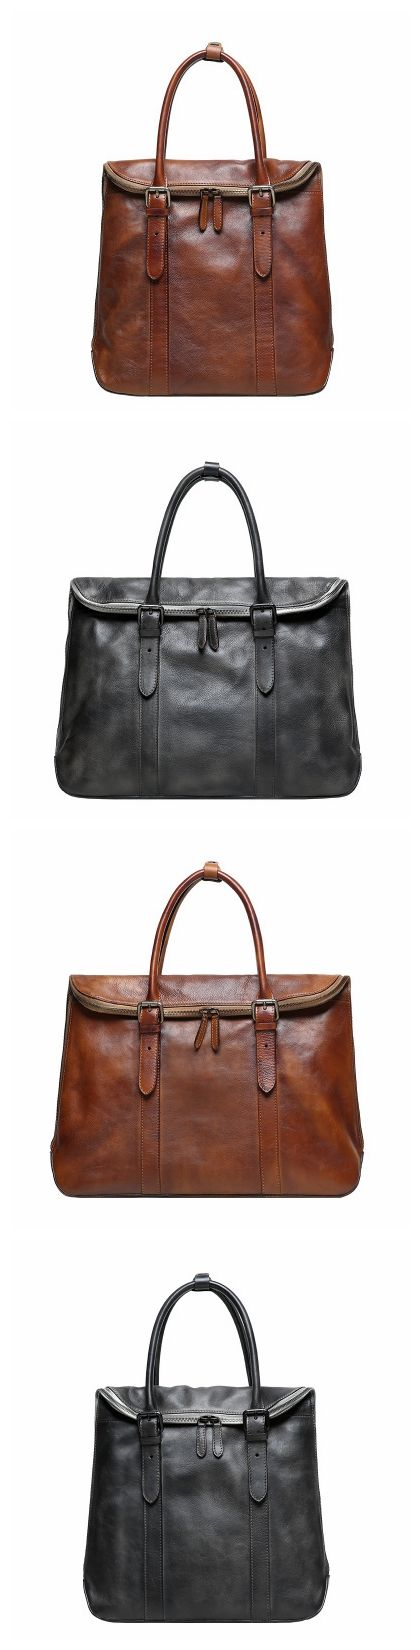 Handmade Vintage Top Grain Leather Briefcase 14'' Leather Laptop Bag Men's Fashion Business Bag GR01 Overview: Design: Men's Leather Briefcase In Stock: 3-5 days For Making Custom: No Color: Vintage B